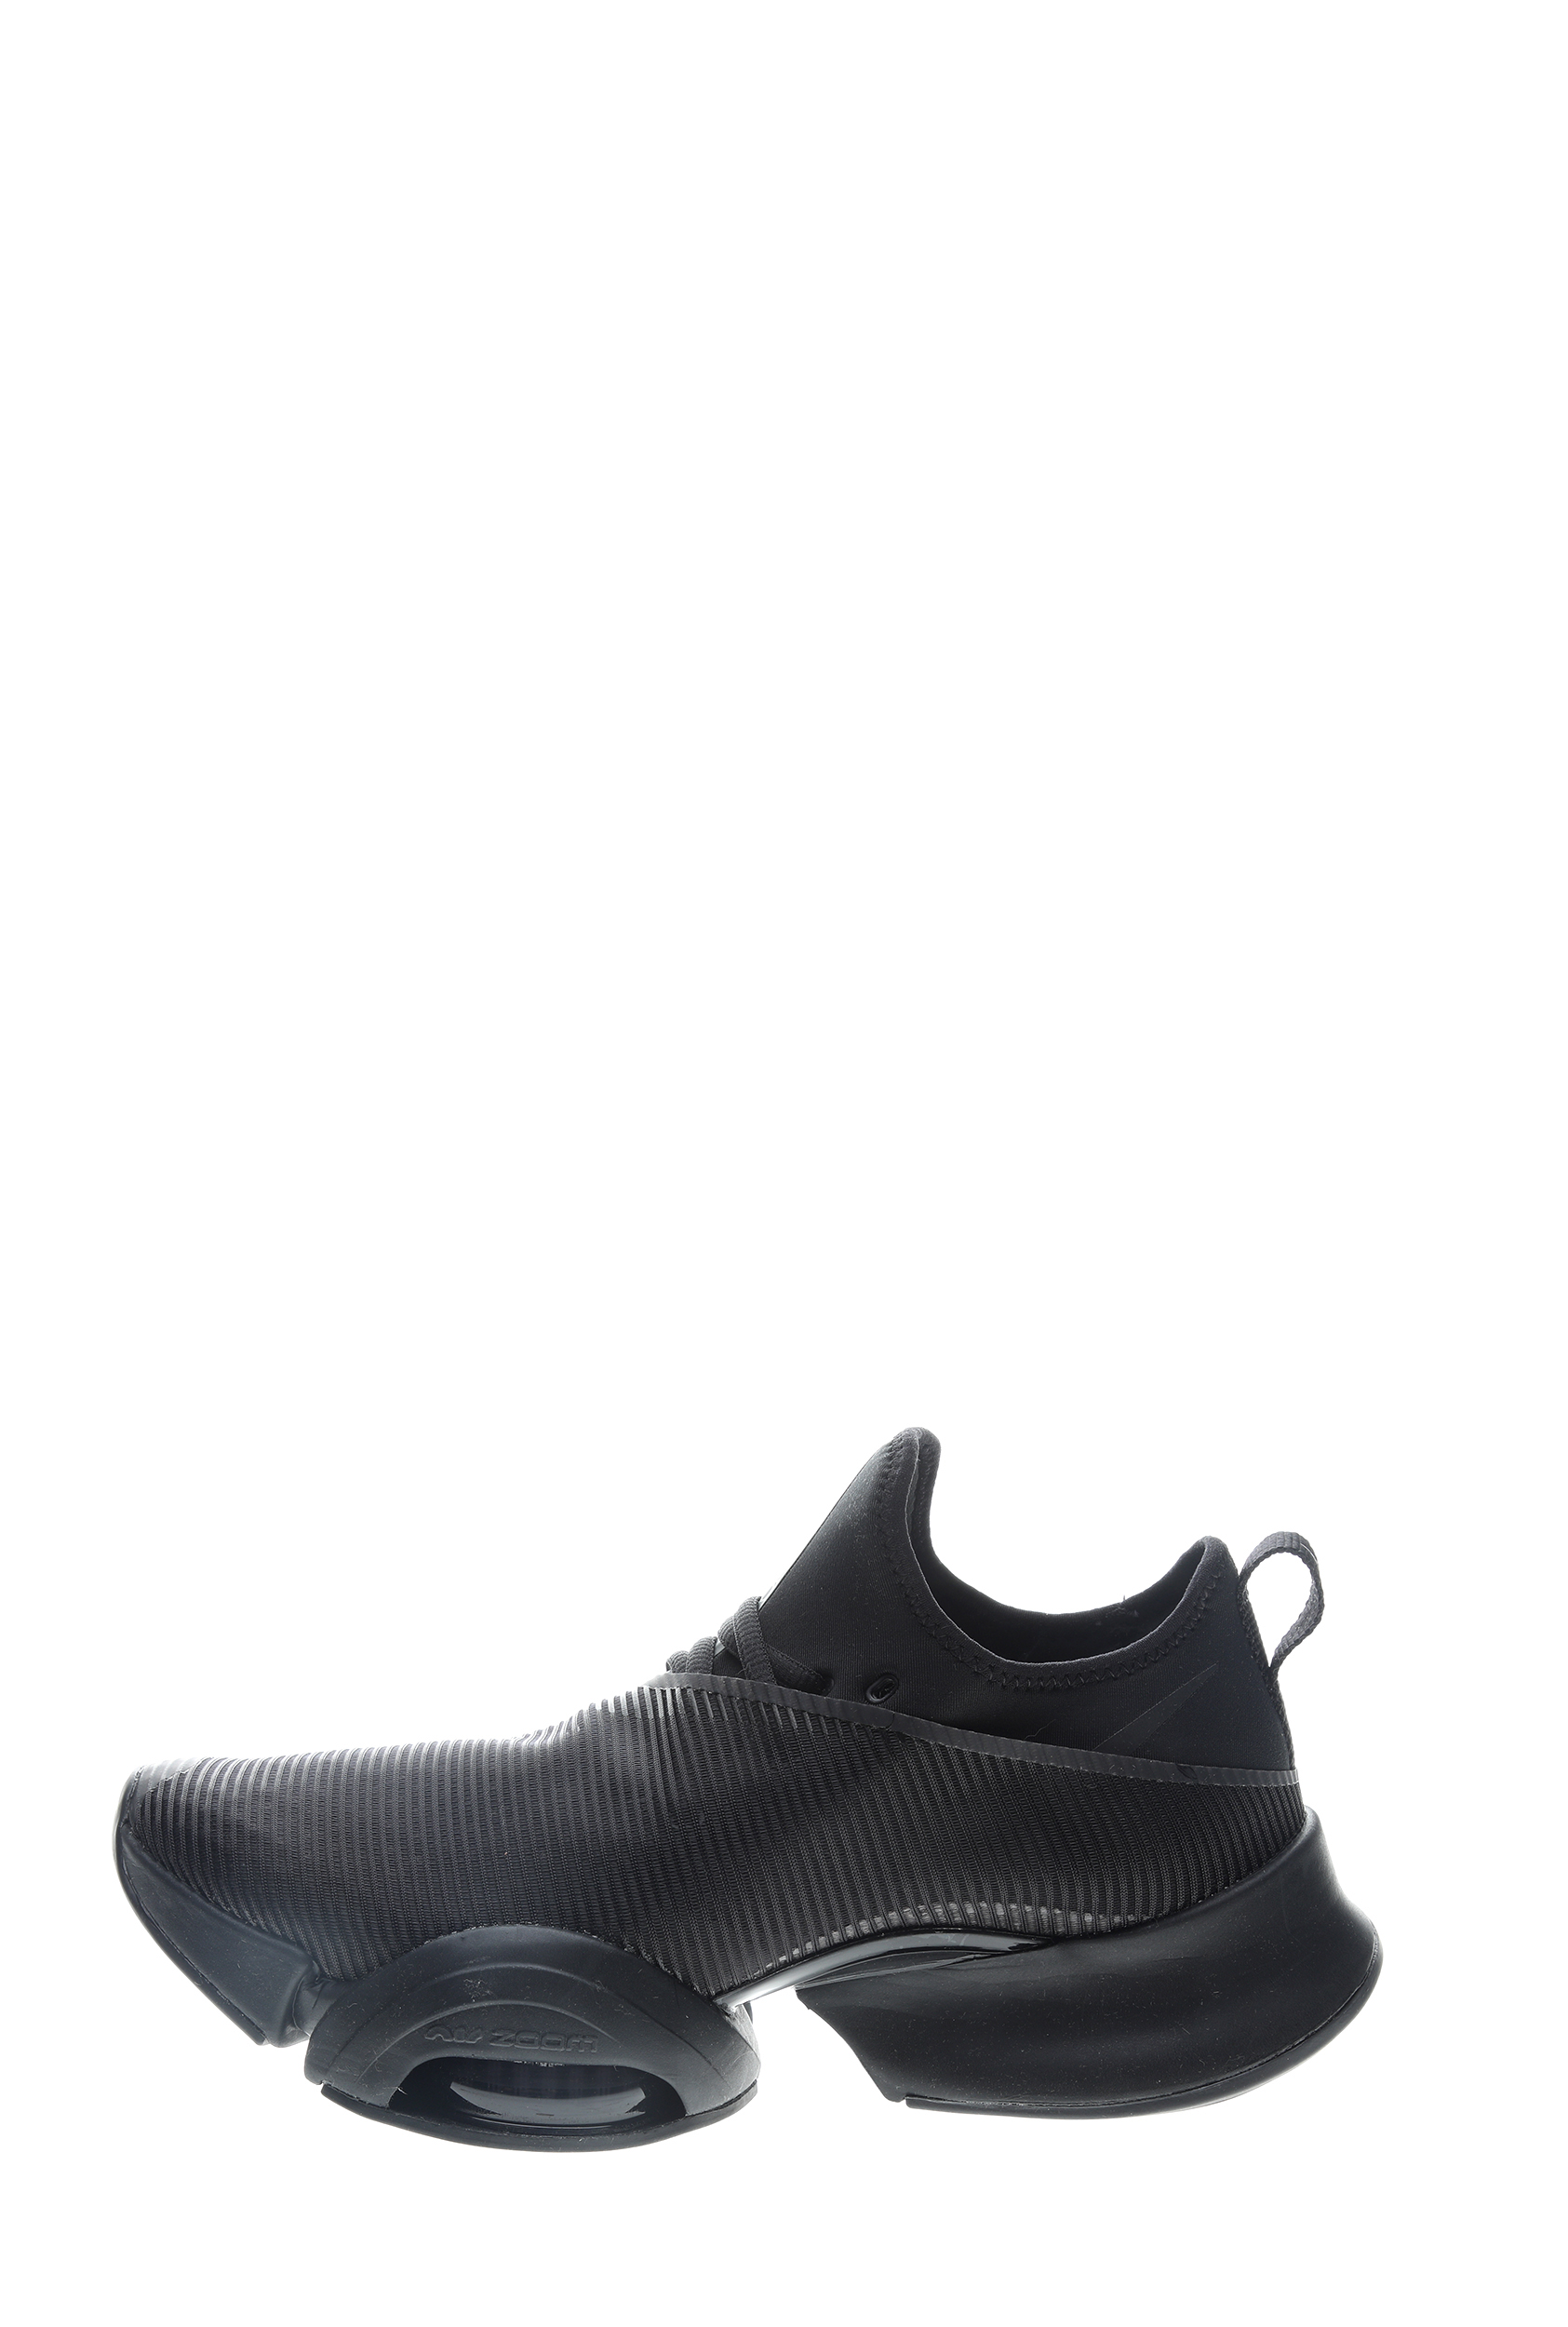 NIKE – Ανδρικά παπούτσια training NIKE AIR ZOOM SUPERREP μαύρα